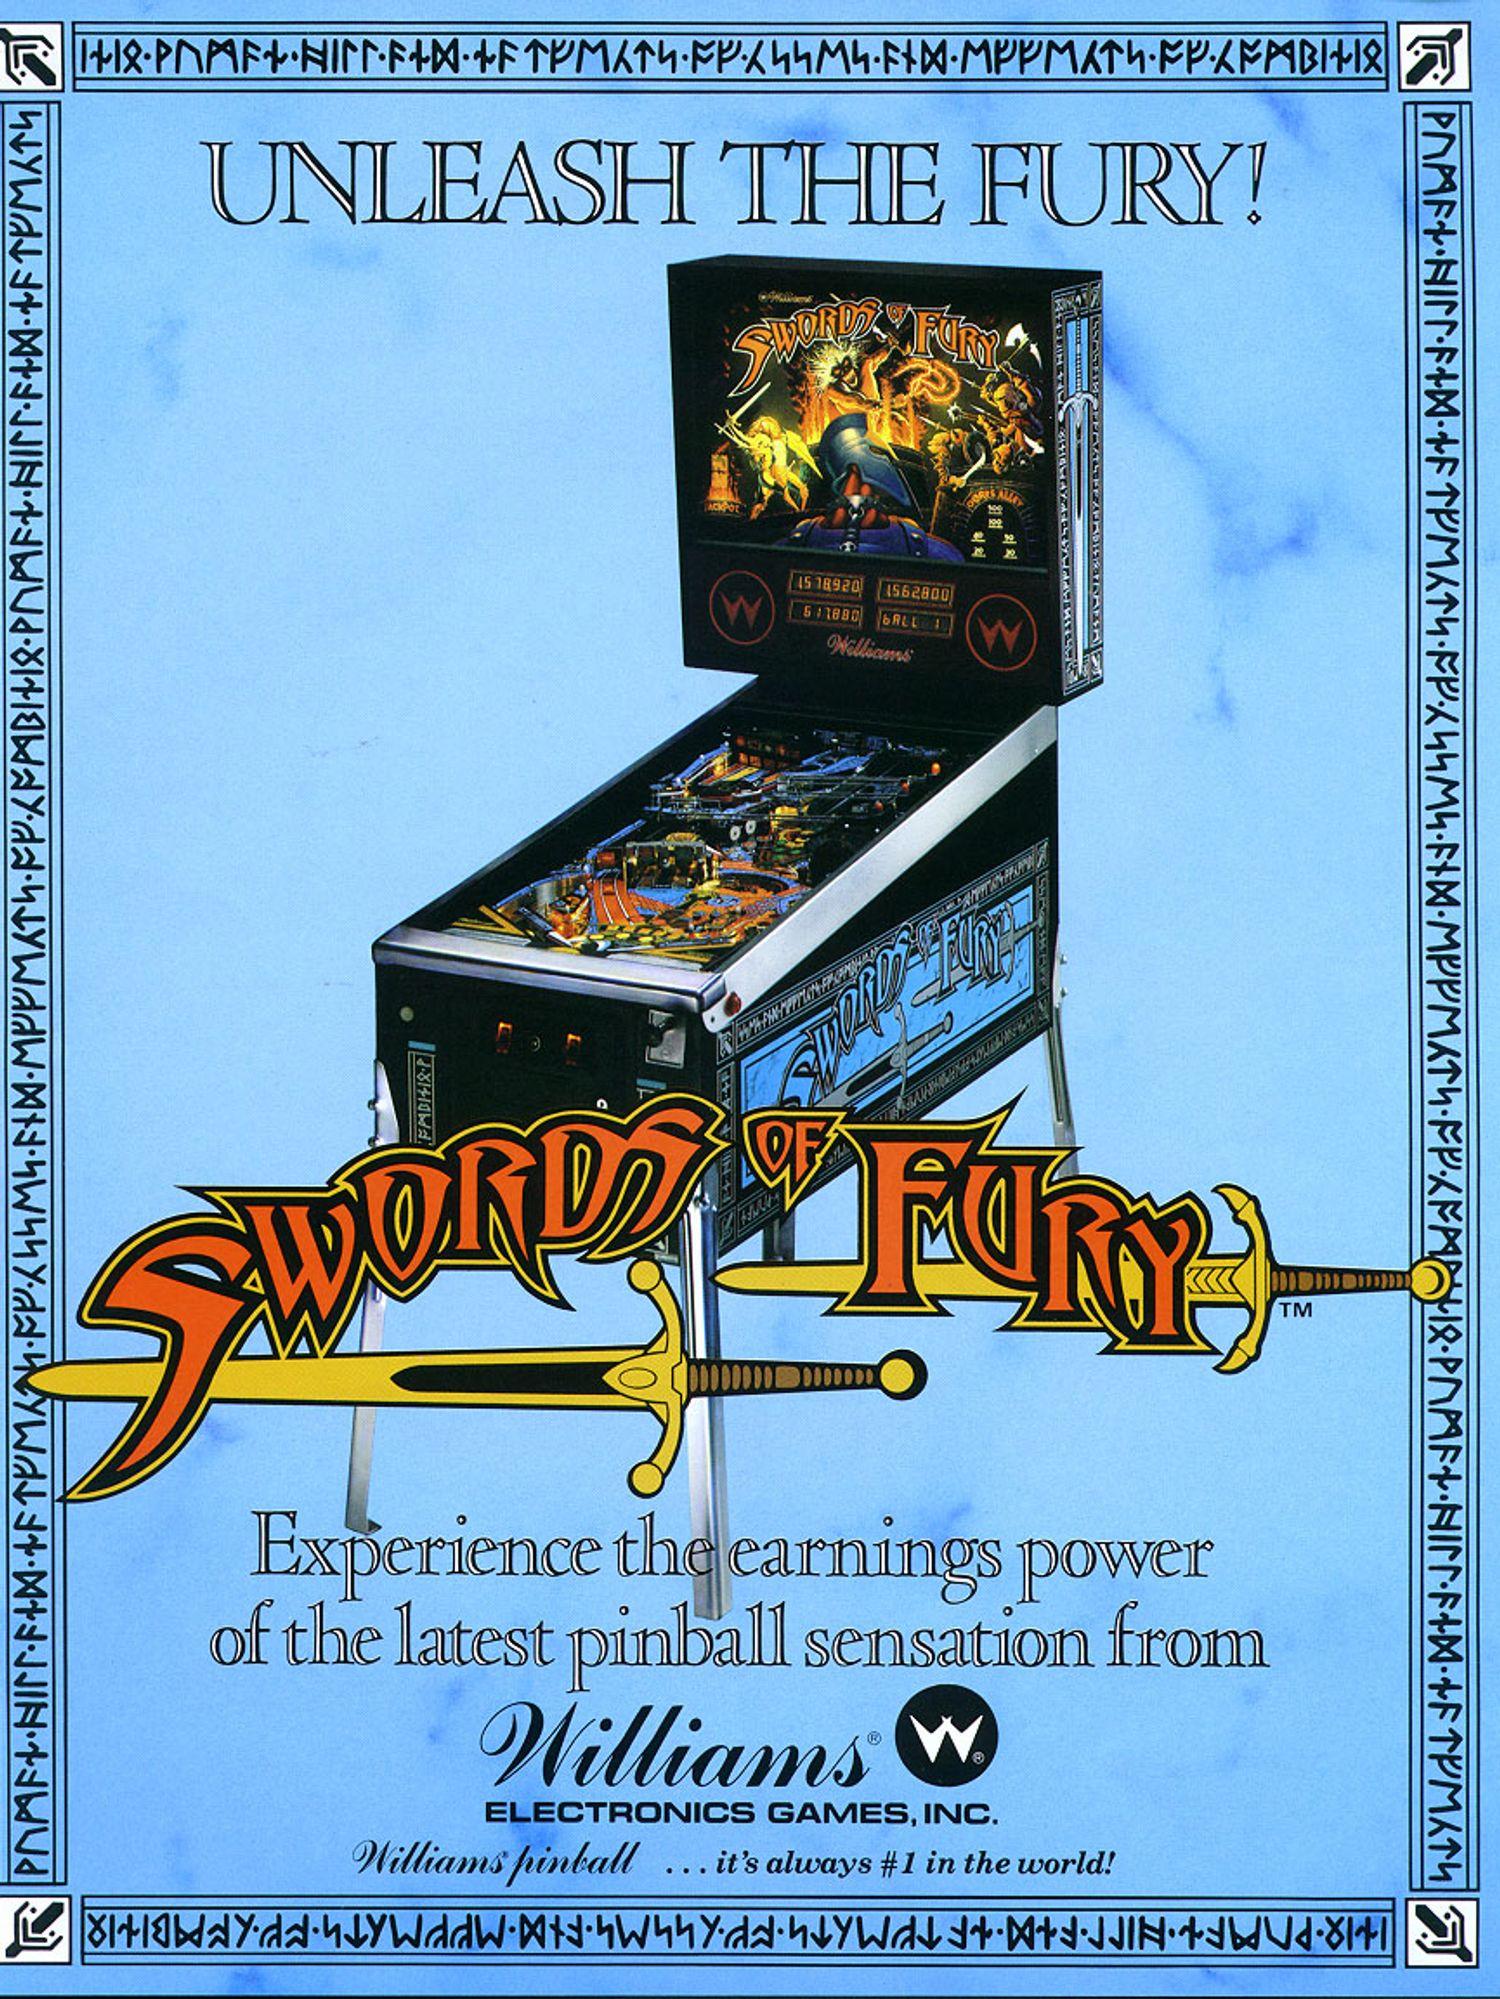 Swords of Fury Flyer Vorderseite